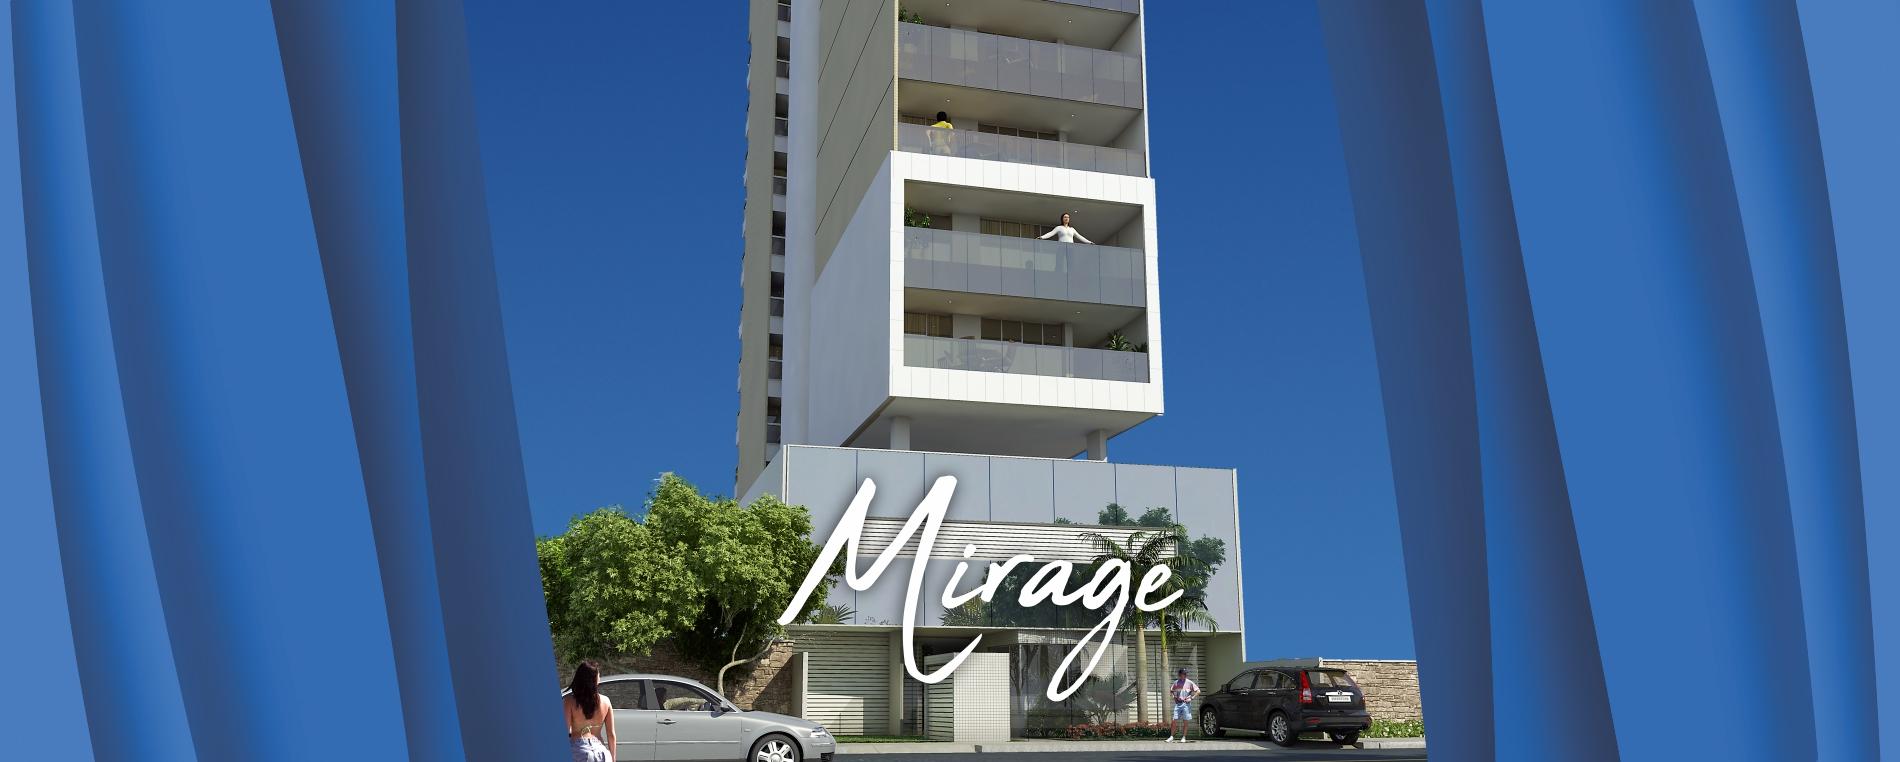 artcon-ed-mirage